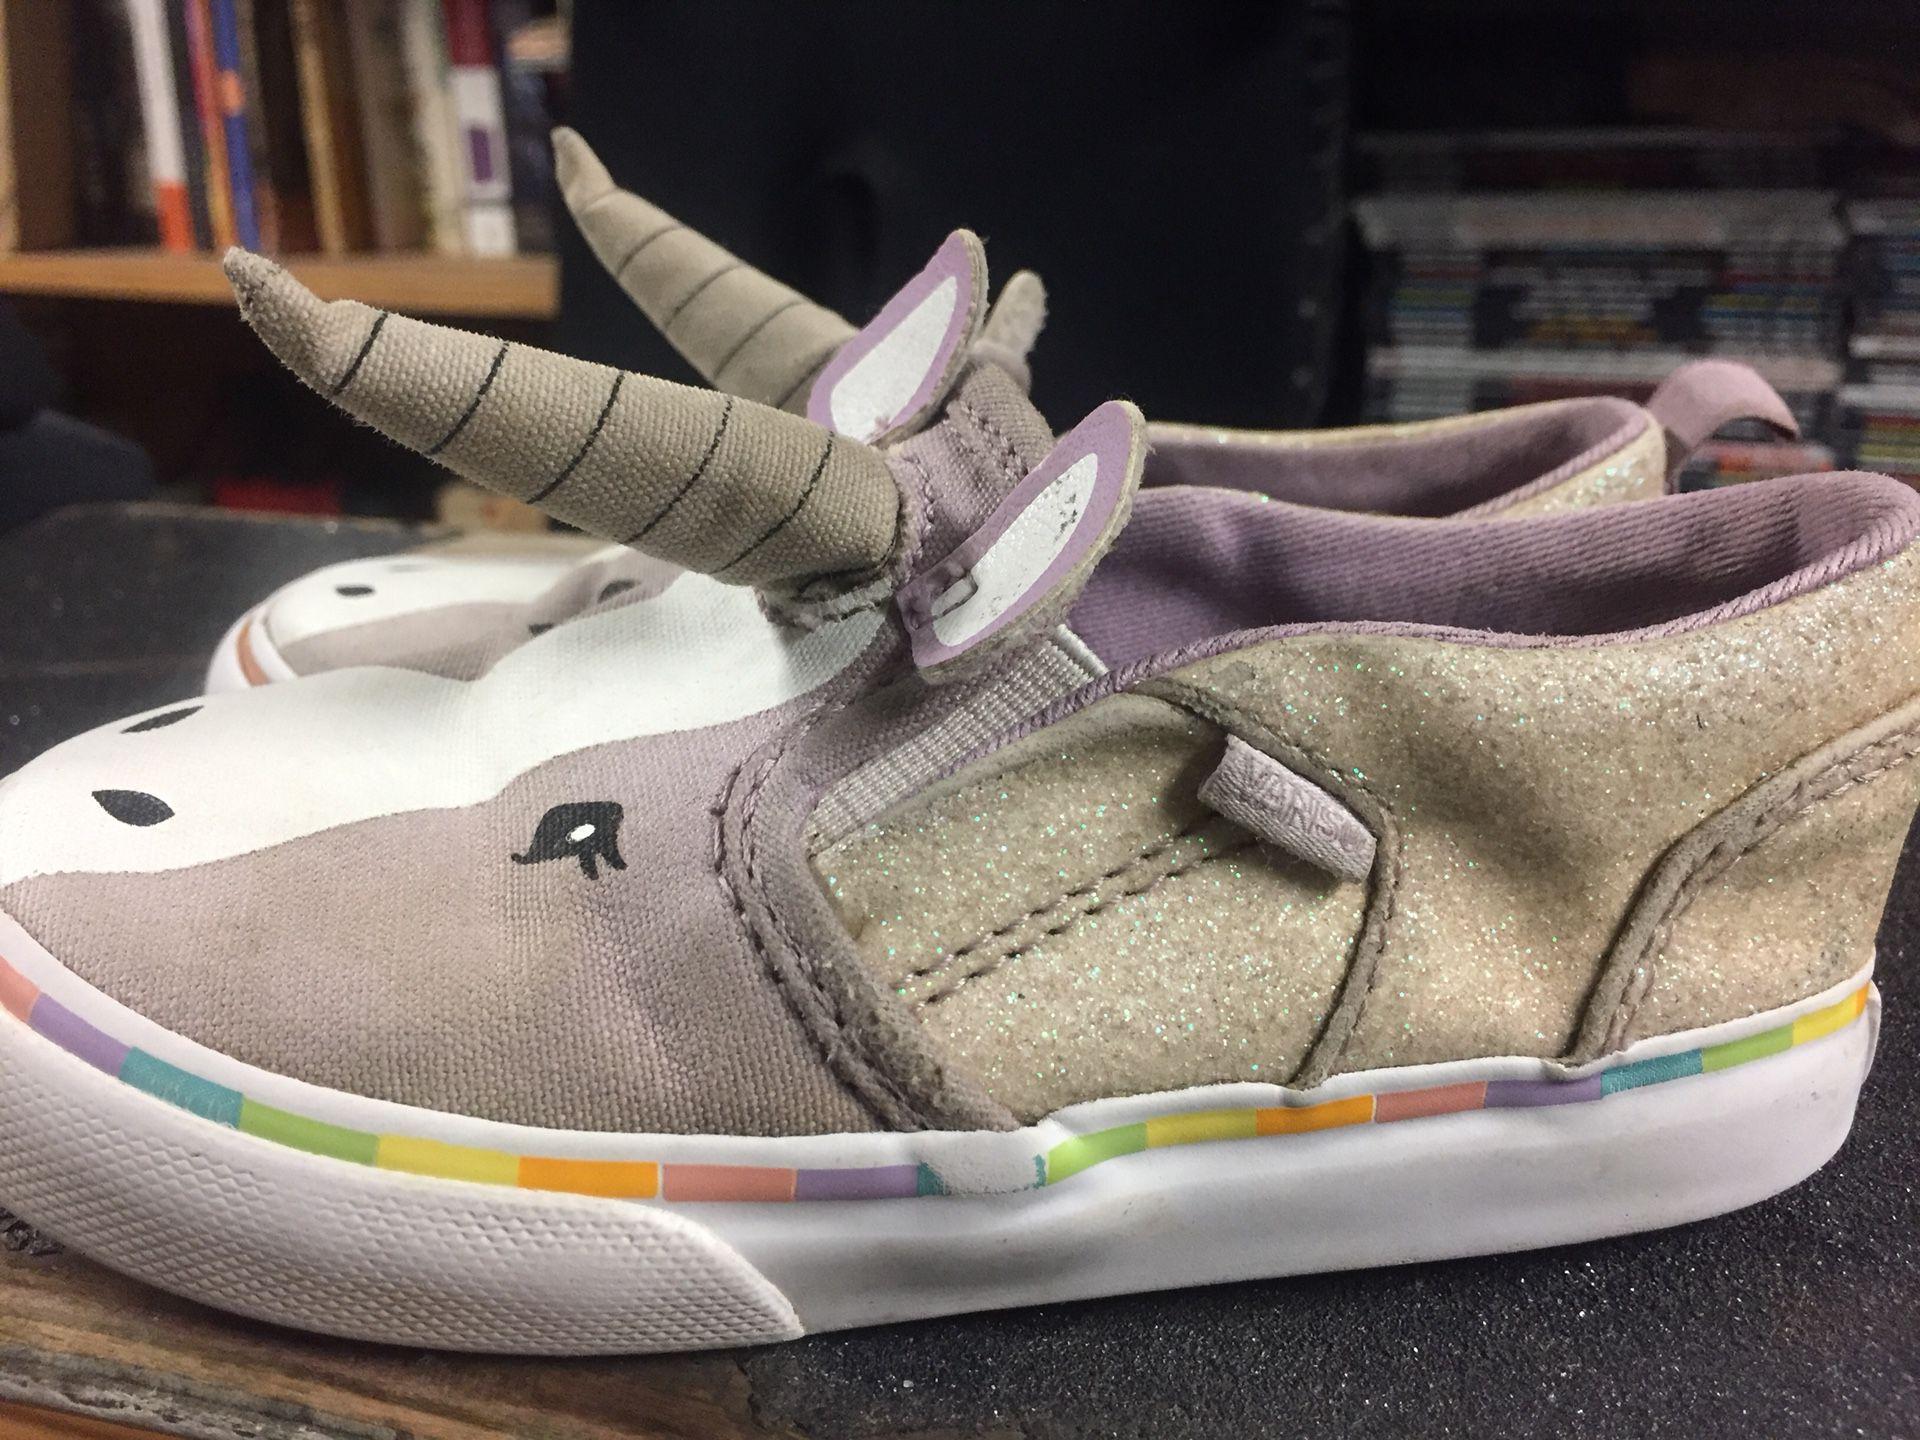 Vans toddler size 8.5 unicorn shoes